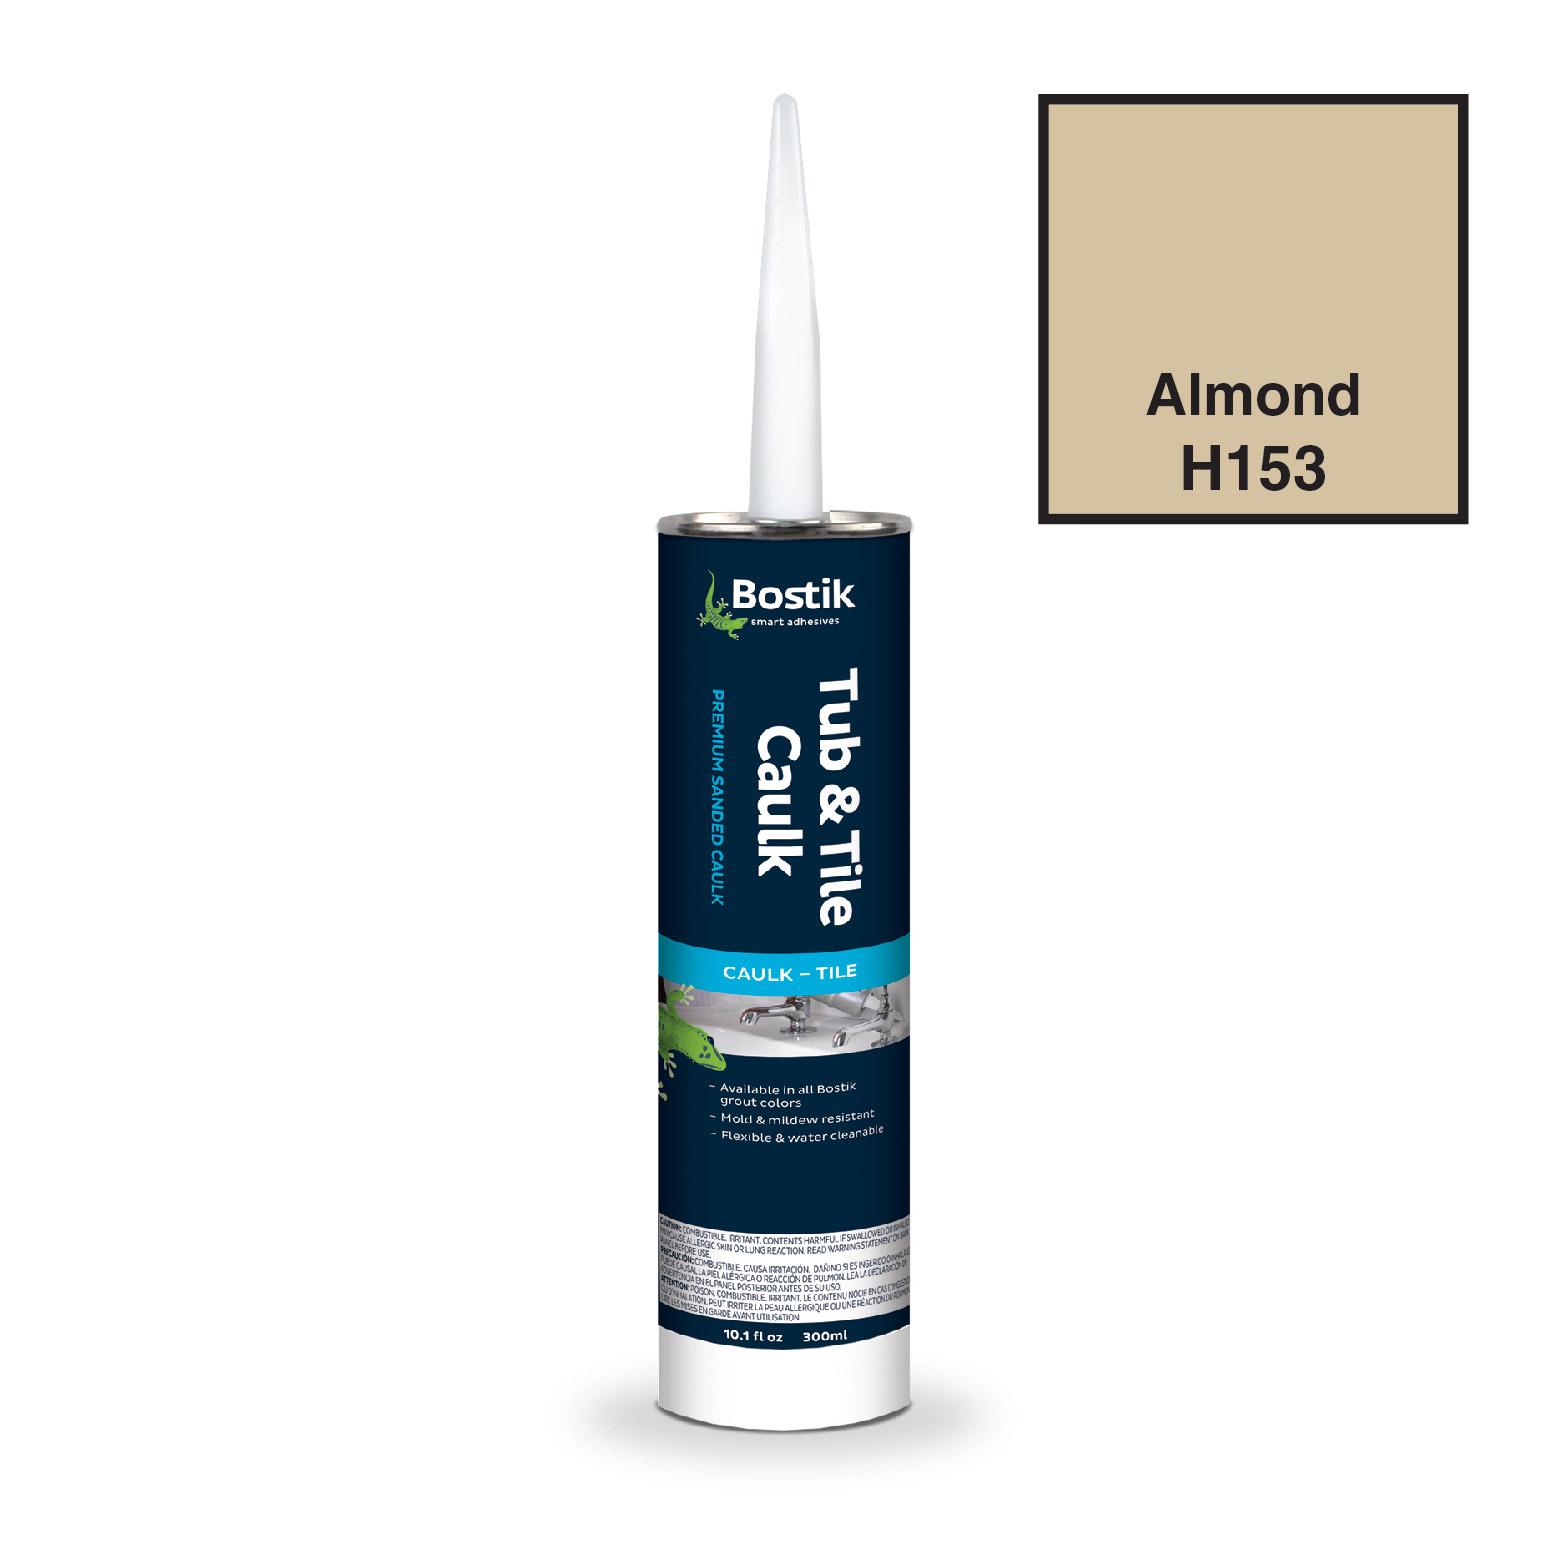 Bostik Tub & Tile Caulk Sanded Almond- H153CS